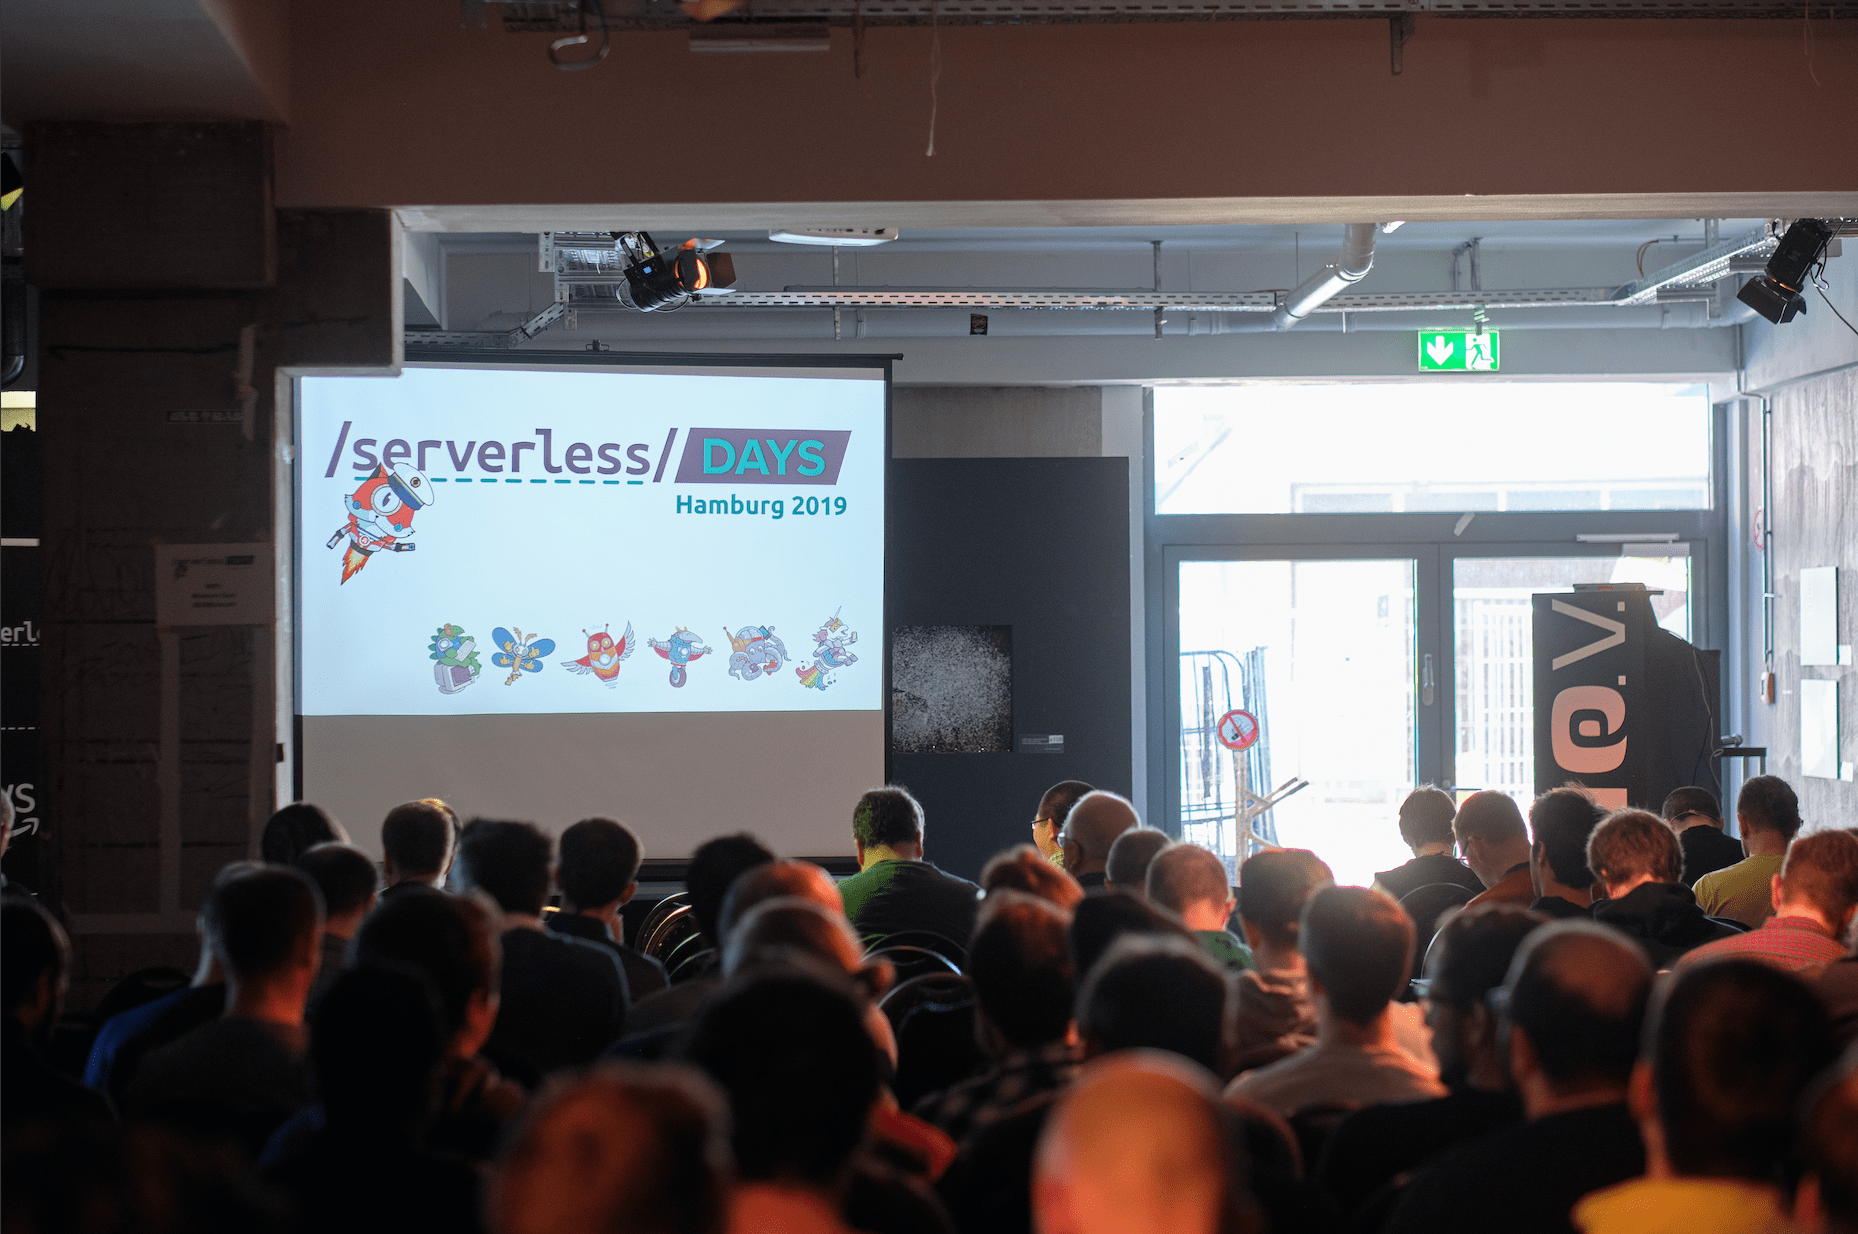 ServerlessDays Hamburg 2019